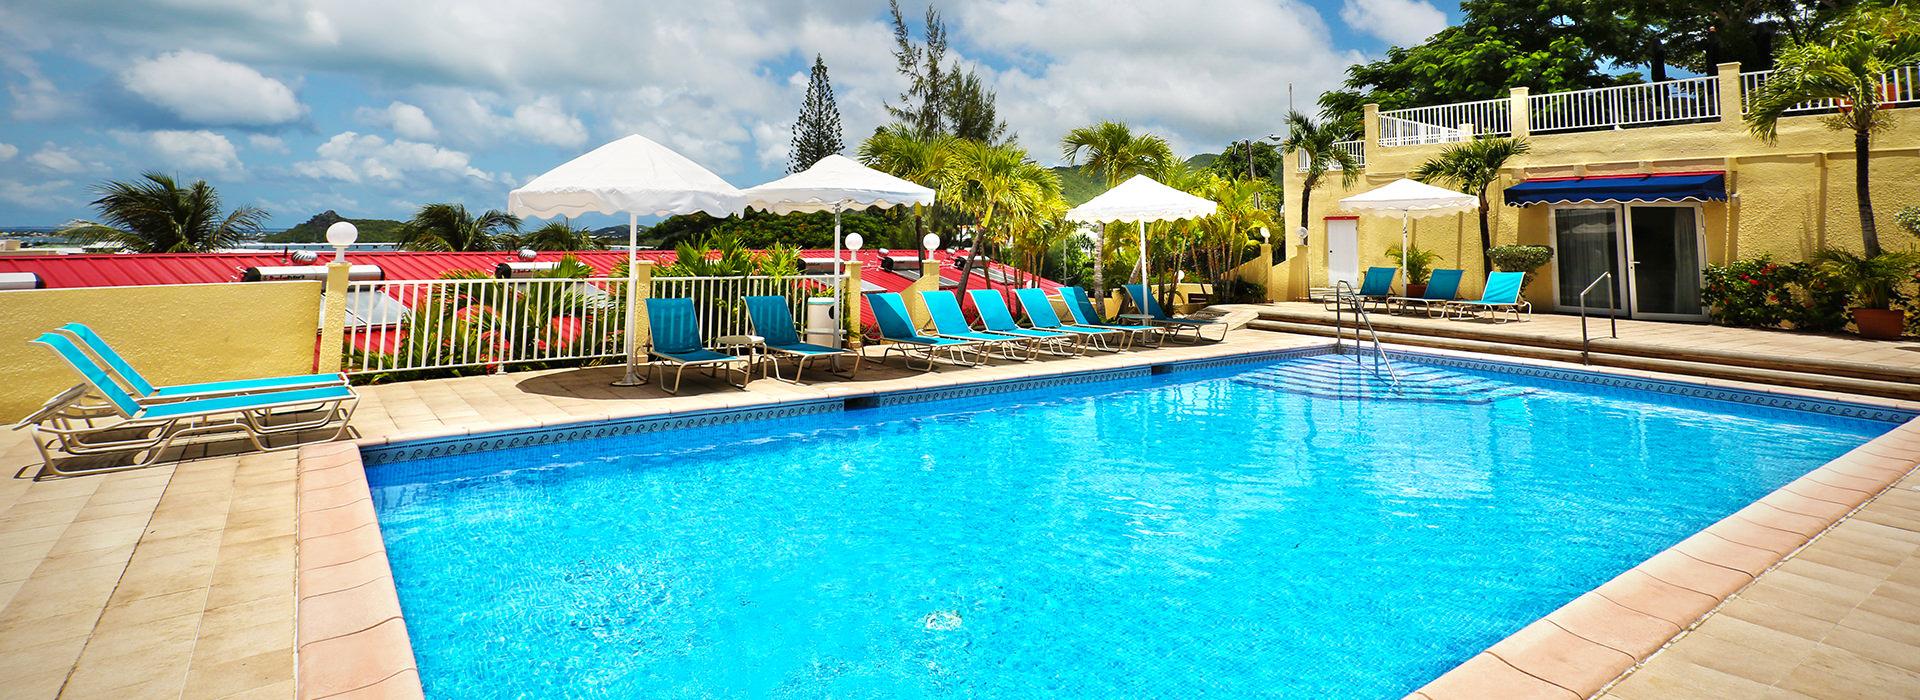 Simpson Bay Beach Resort & Marina pool